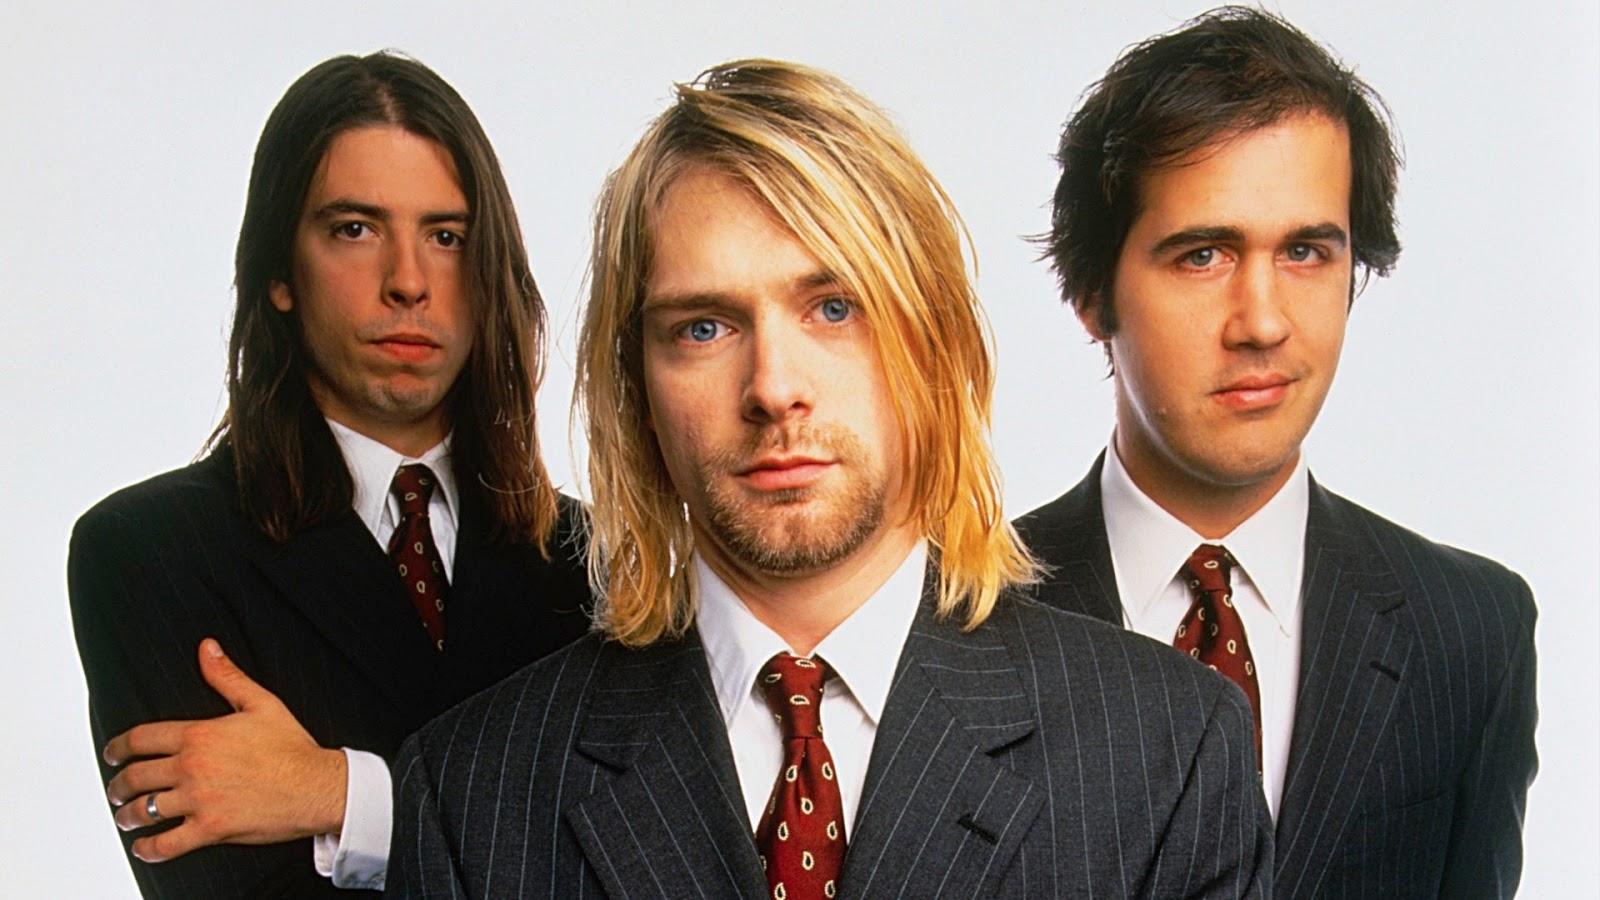 Nirvana band members Kurt Cobain Dave Grohl Krist Novoselic